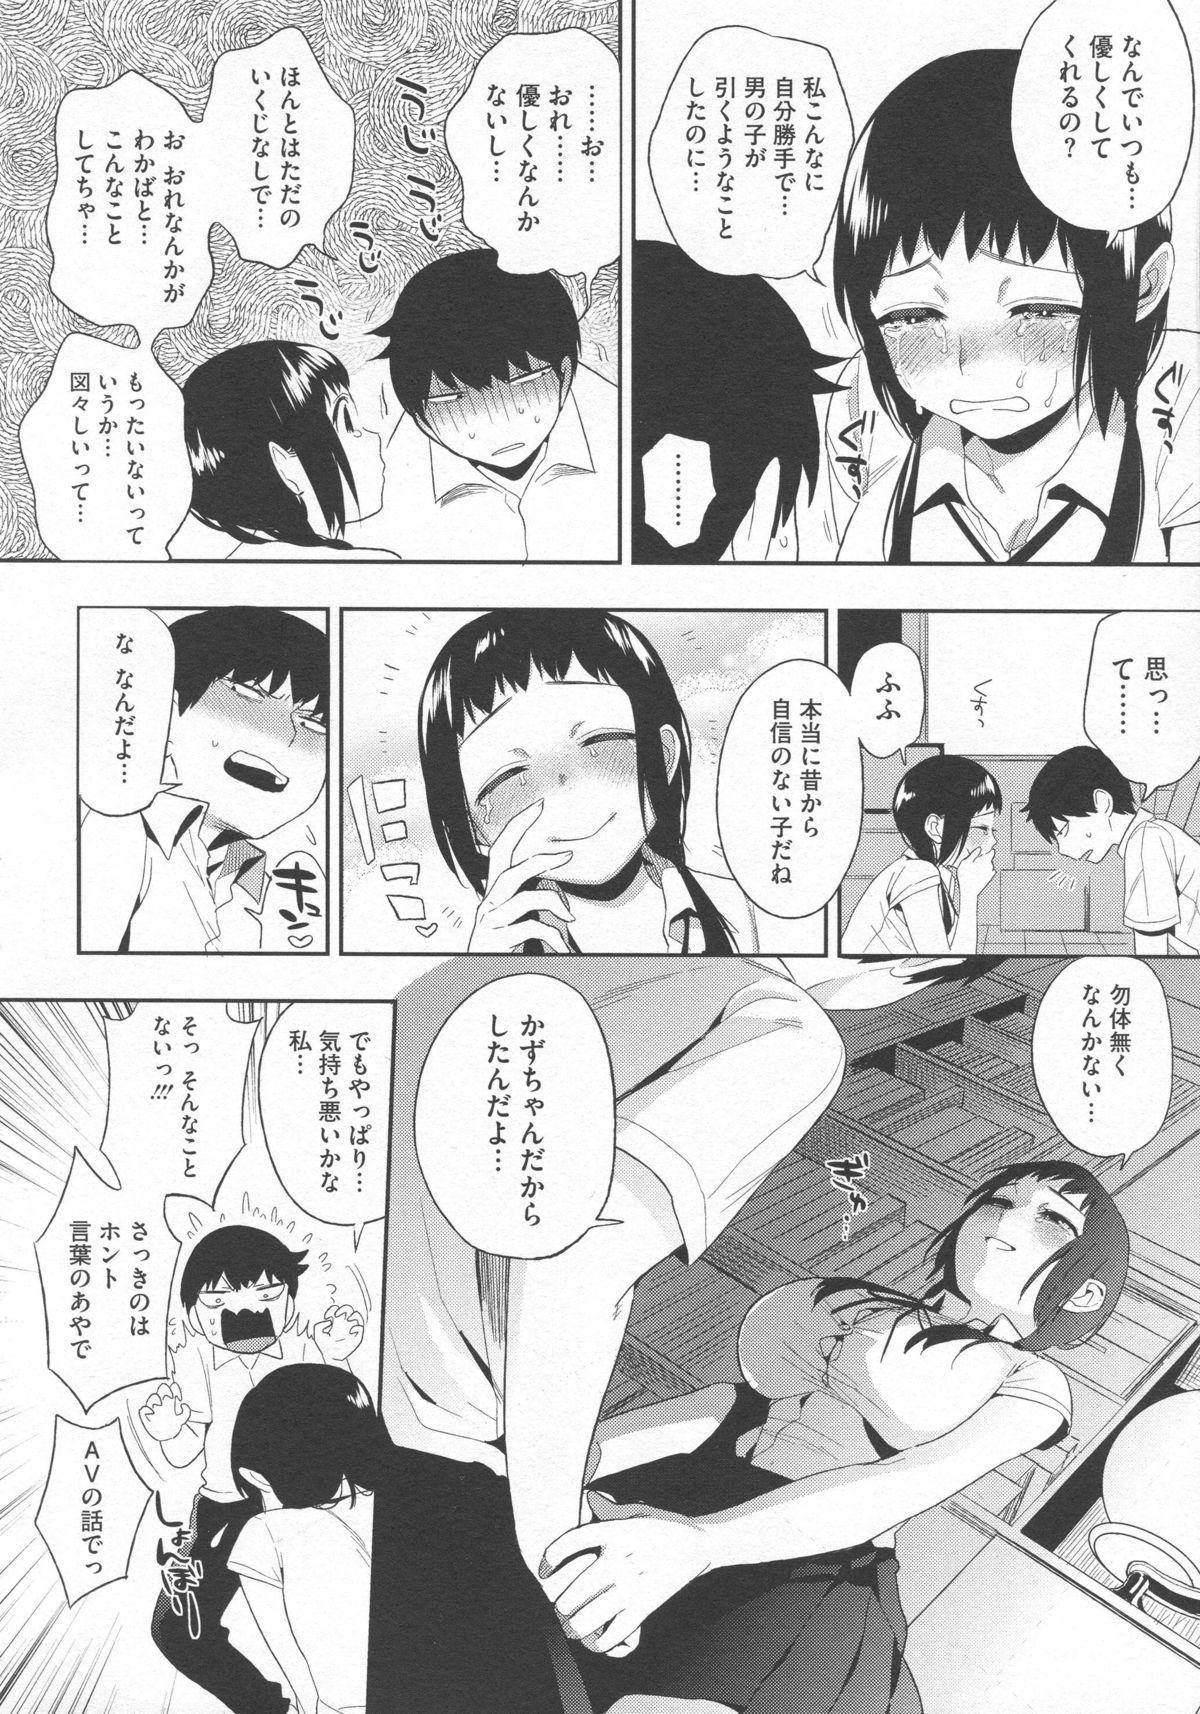 Boku Dake no Yuuyami - Only My Twilight 46